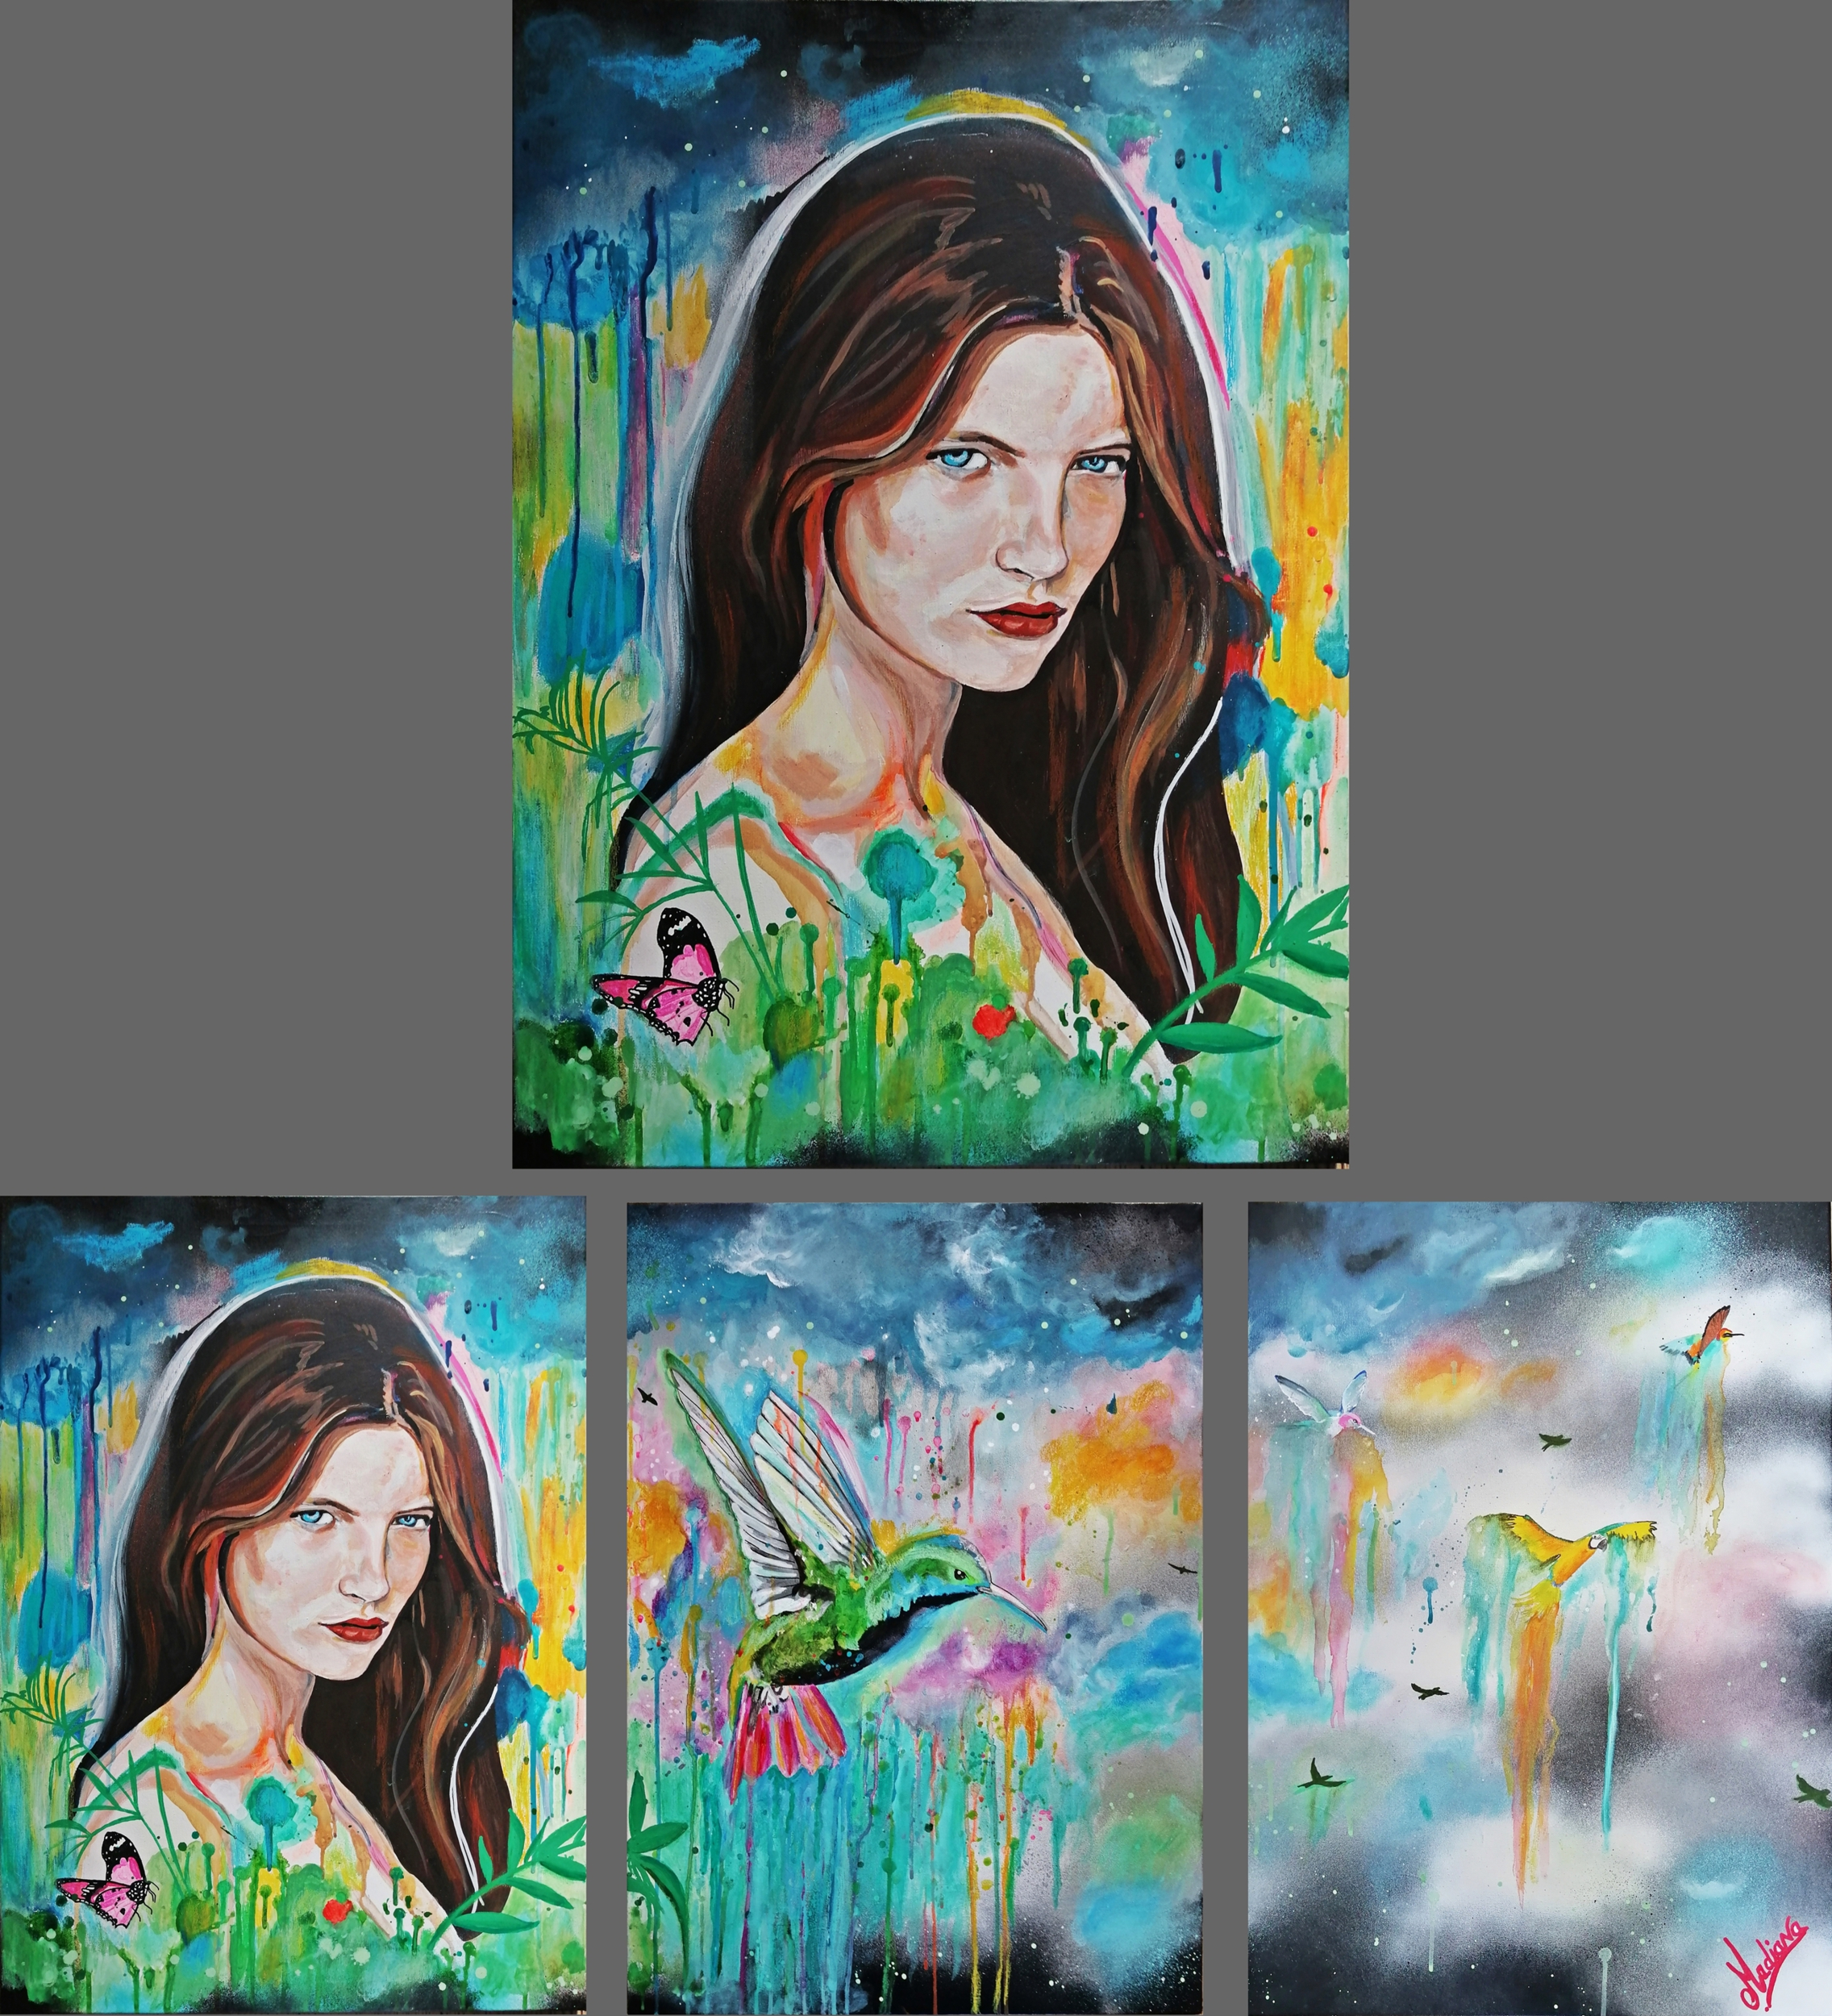 tableau art design contemporain nature femme oiseau colibri 5